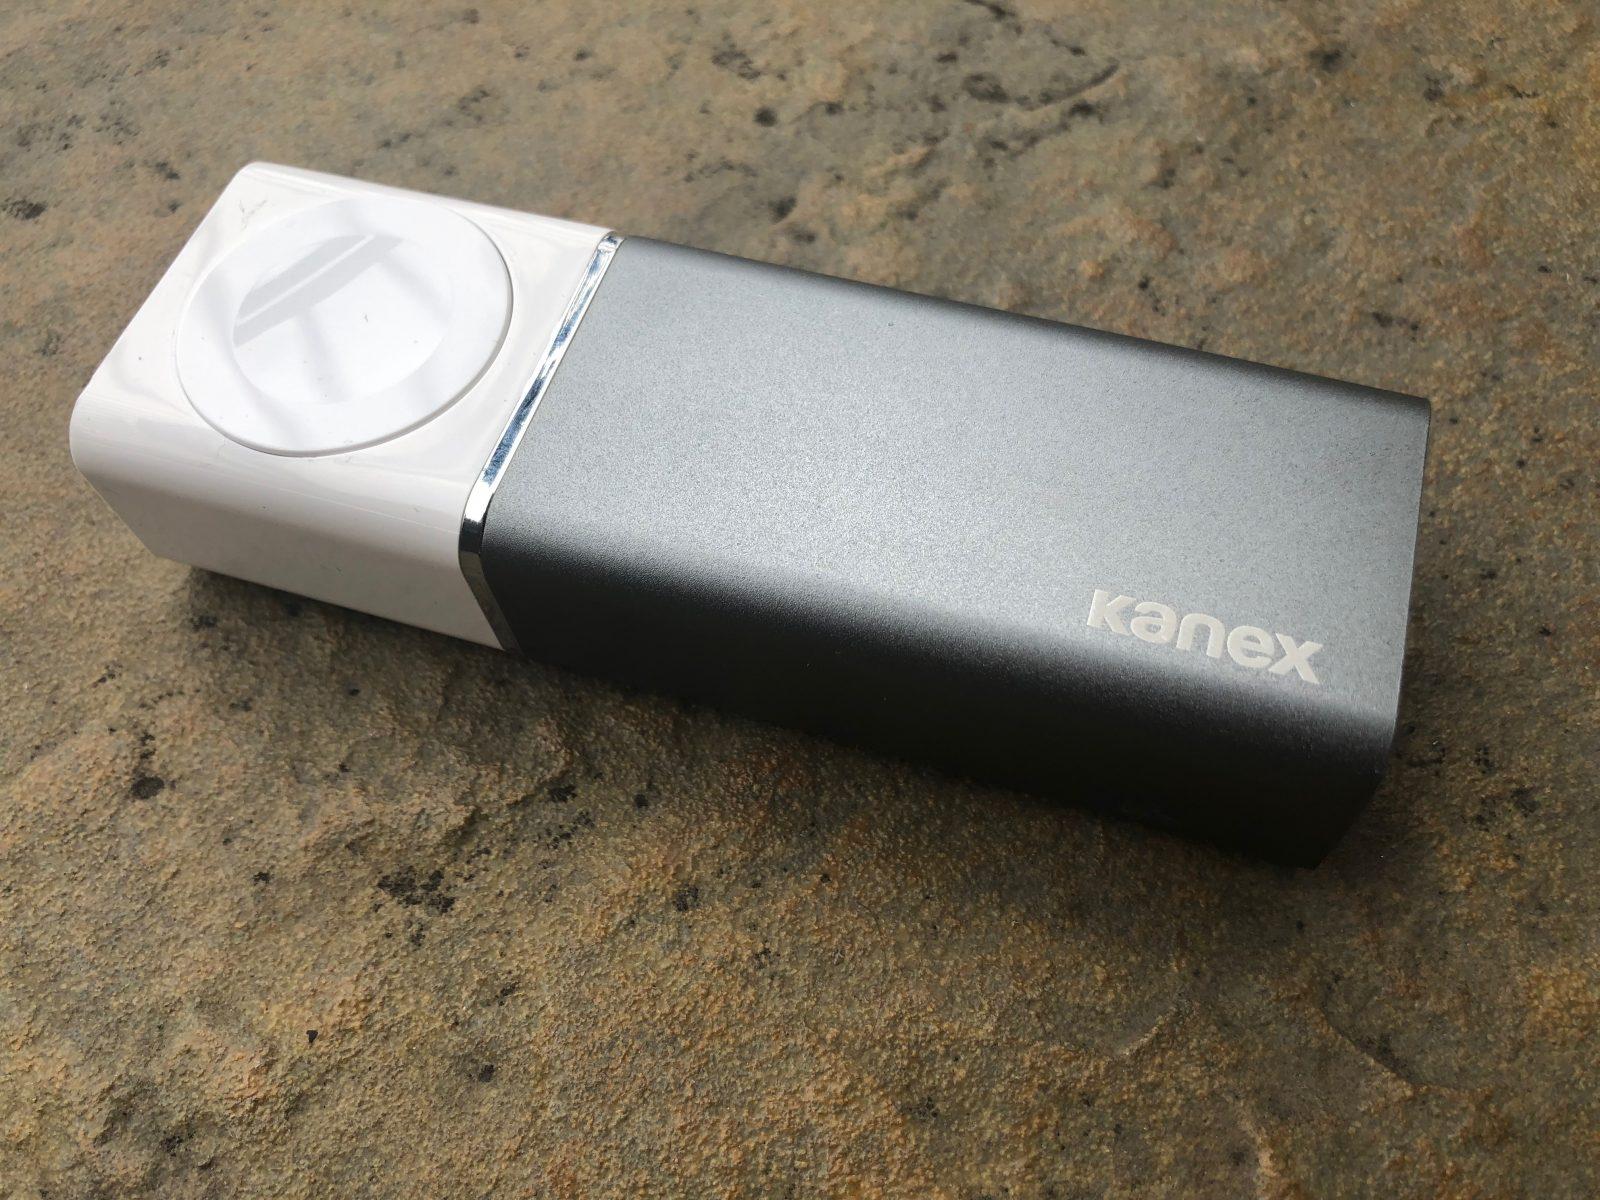 KANEX Go Power Watch Plus Portable Battery